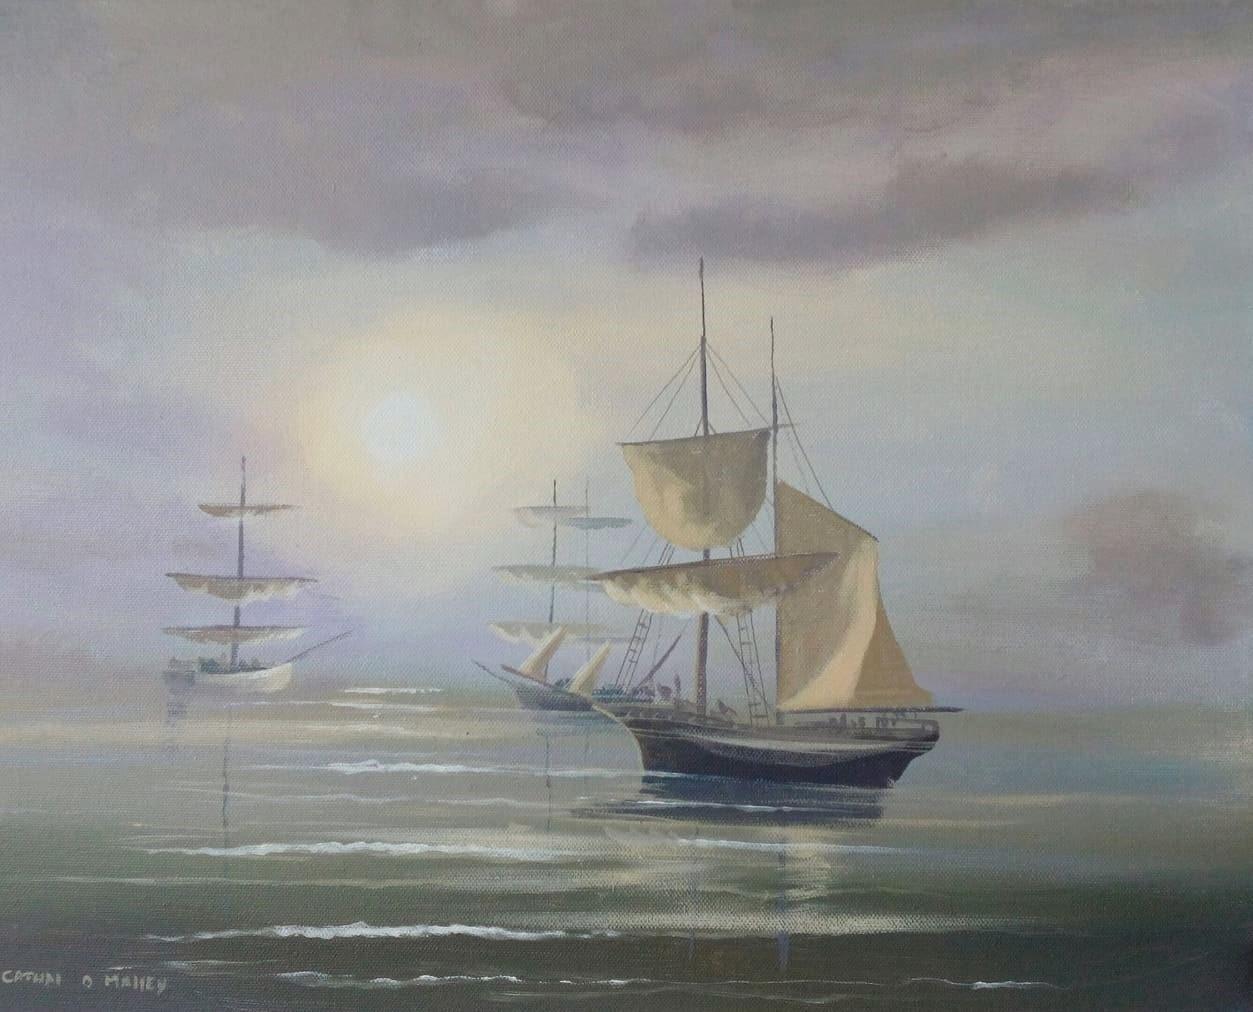 Cathal O Malley - kinsale ships